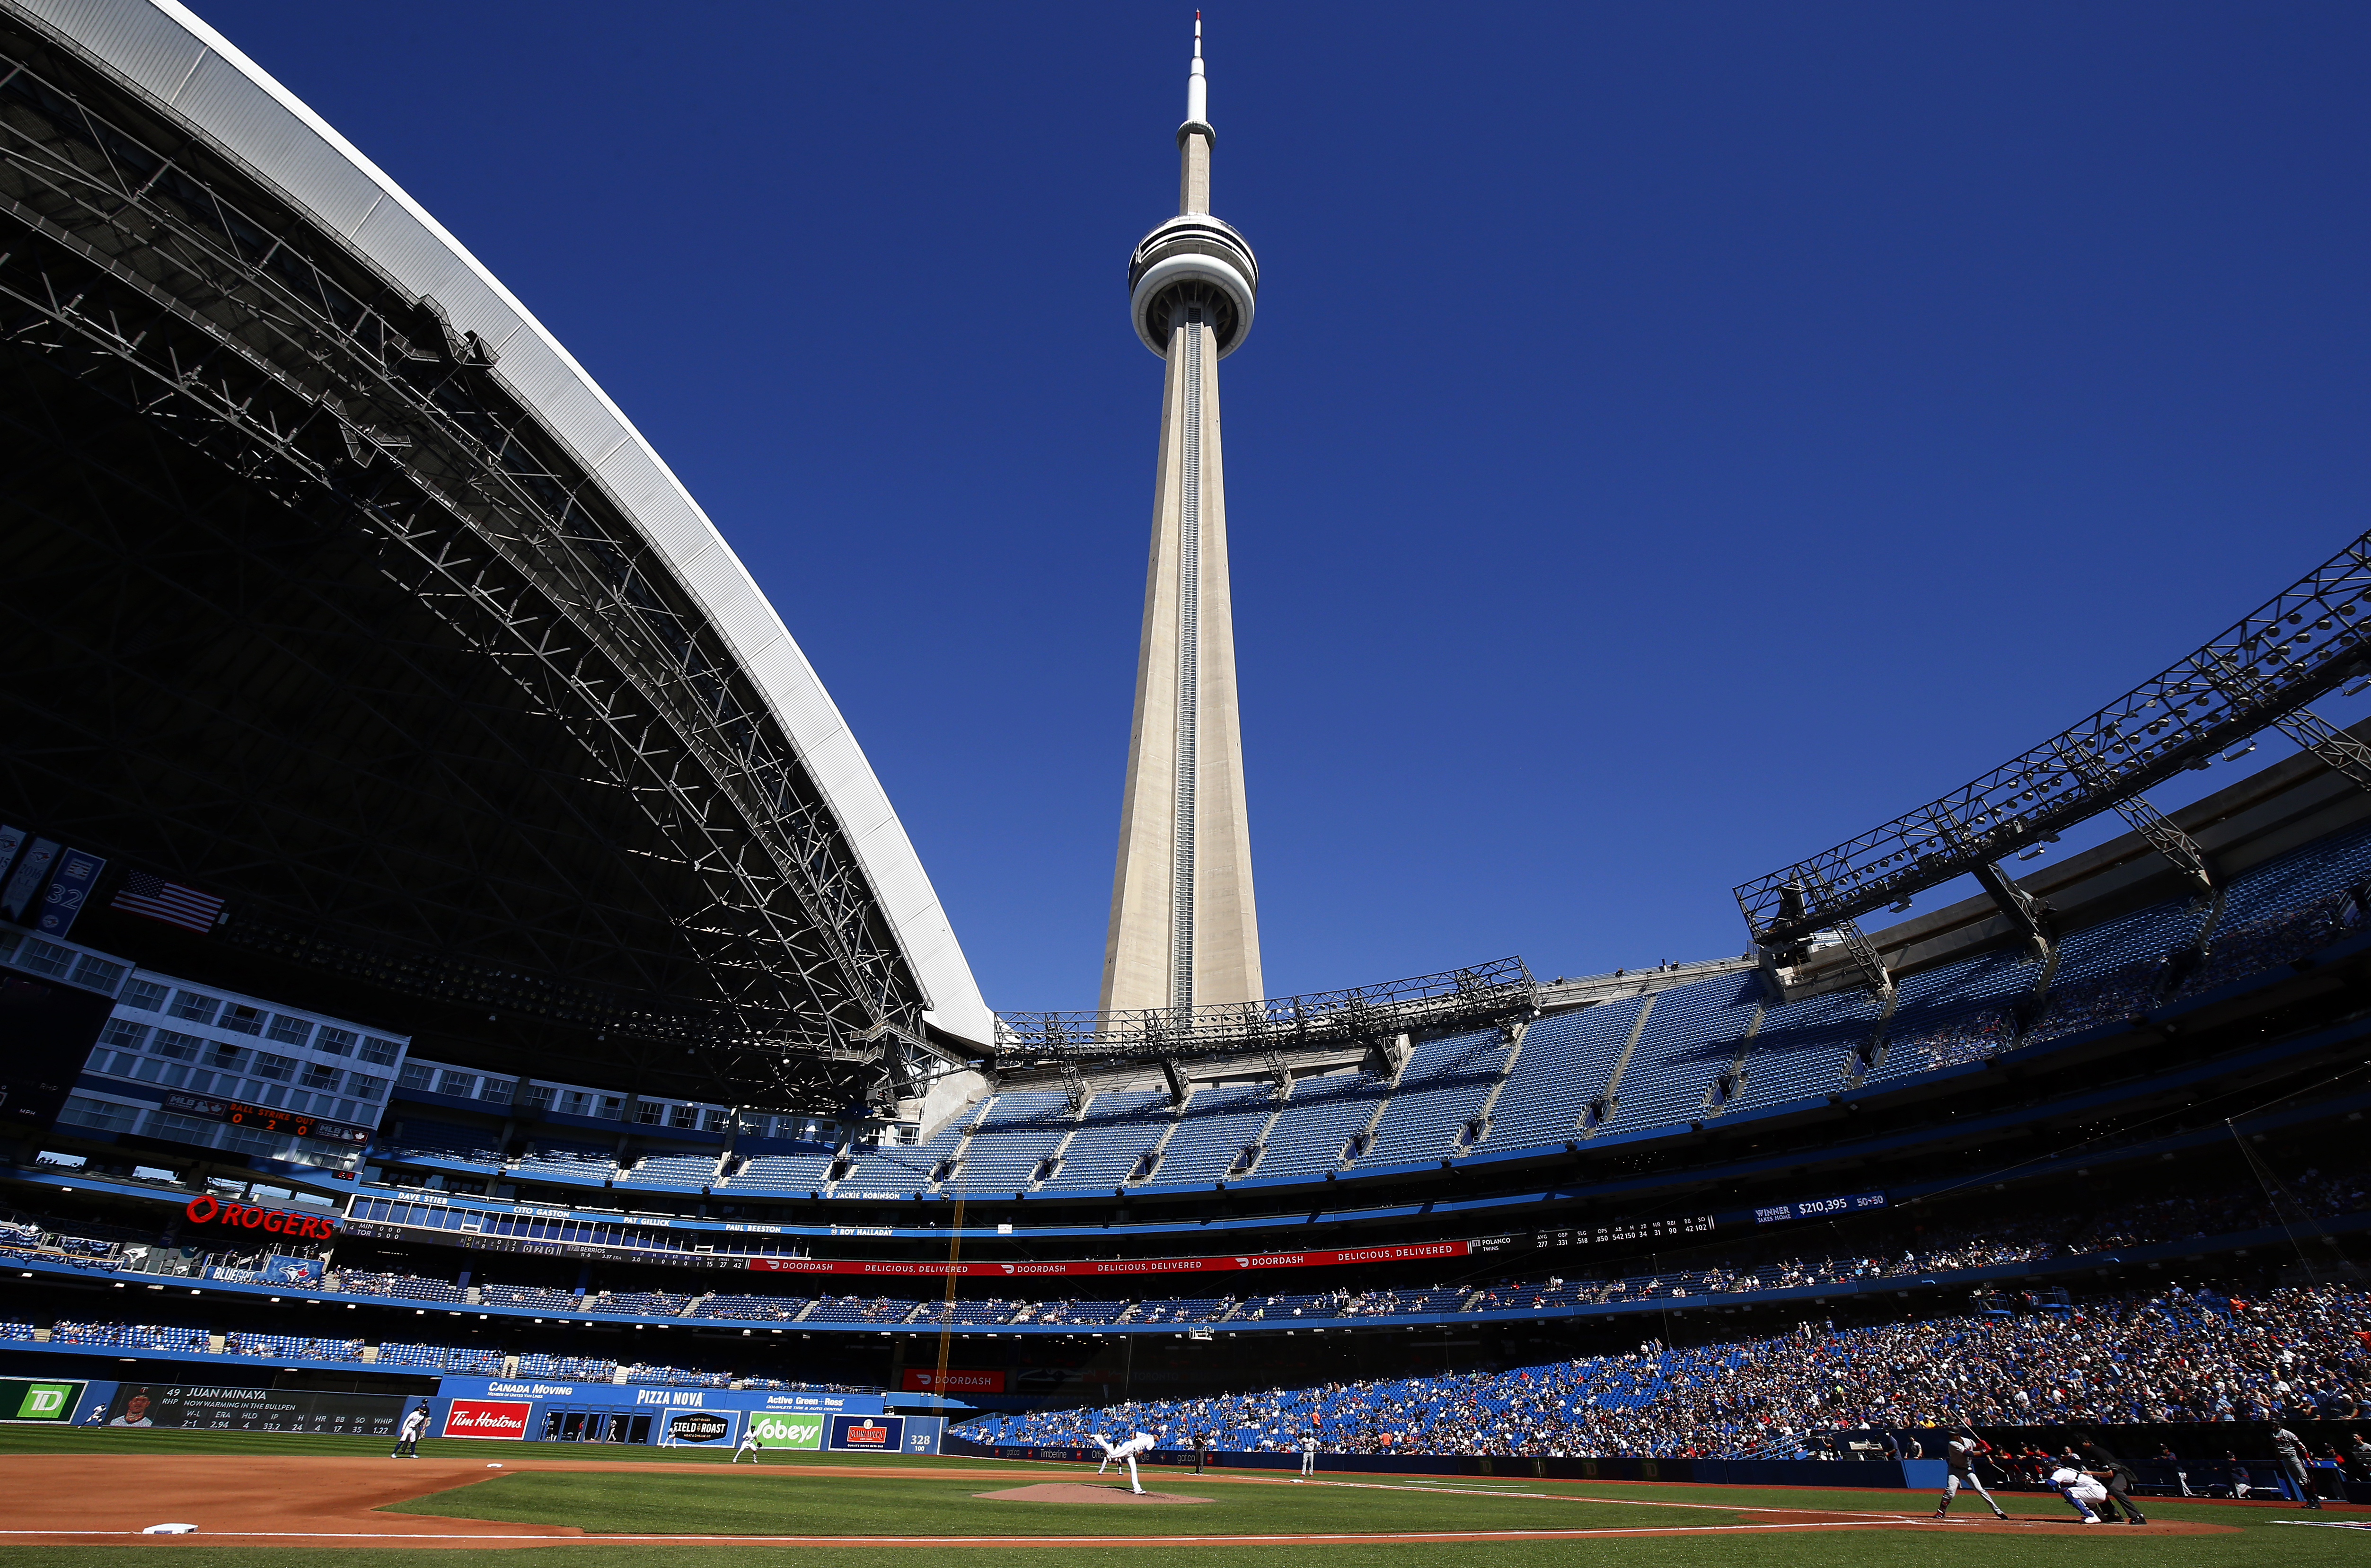 Minnesota Twins v Toronto Blue Jays